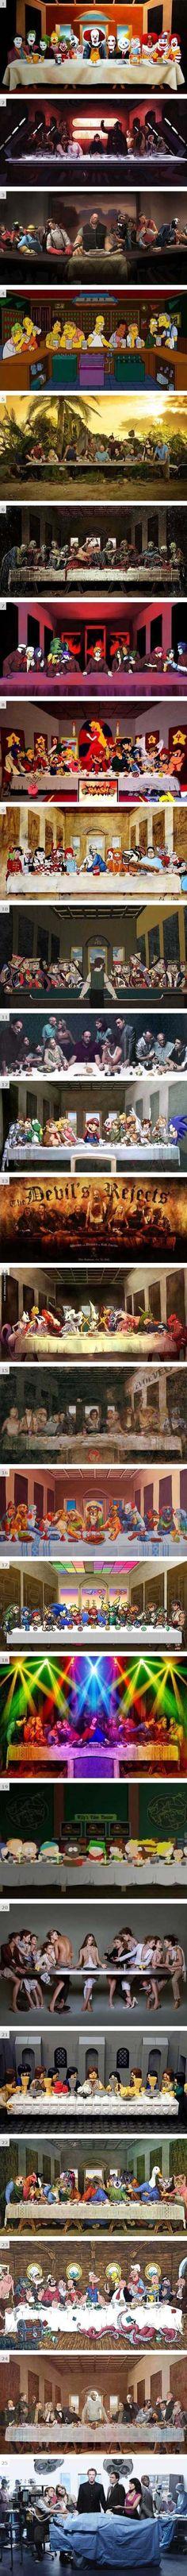 The Last Supper Parodies - Damn! LOL